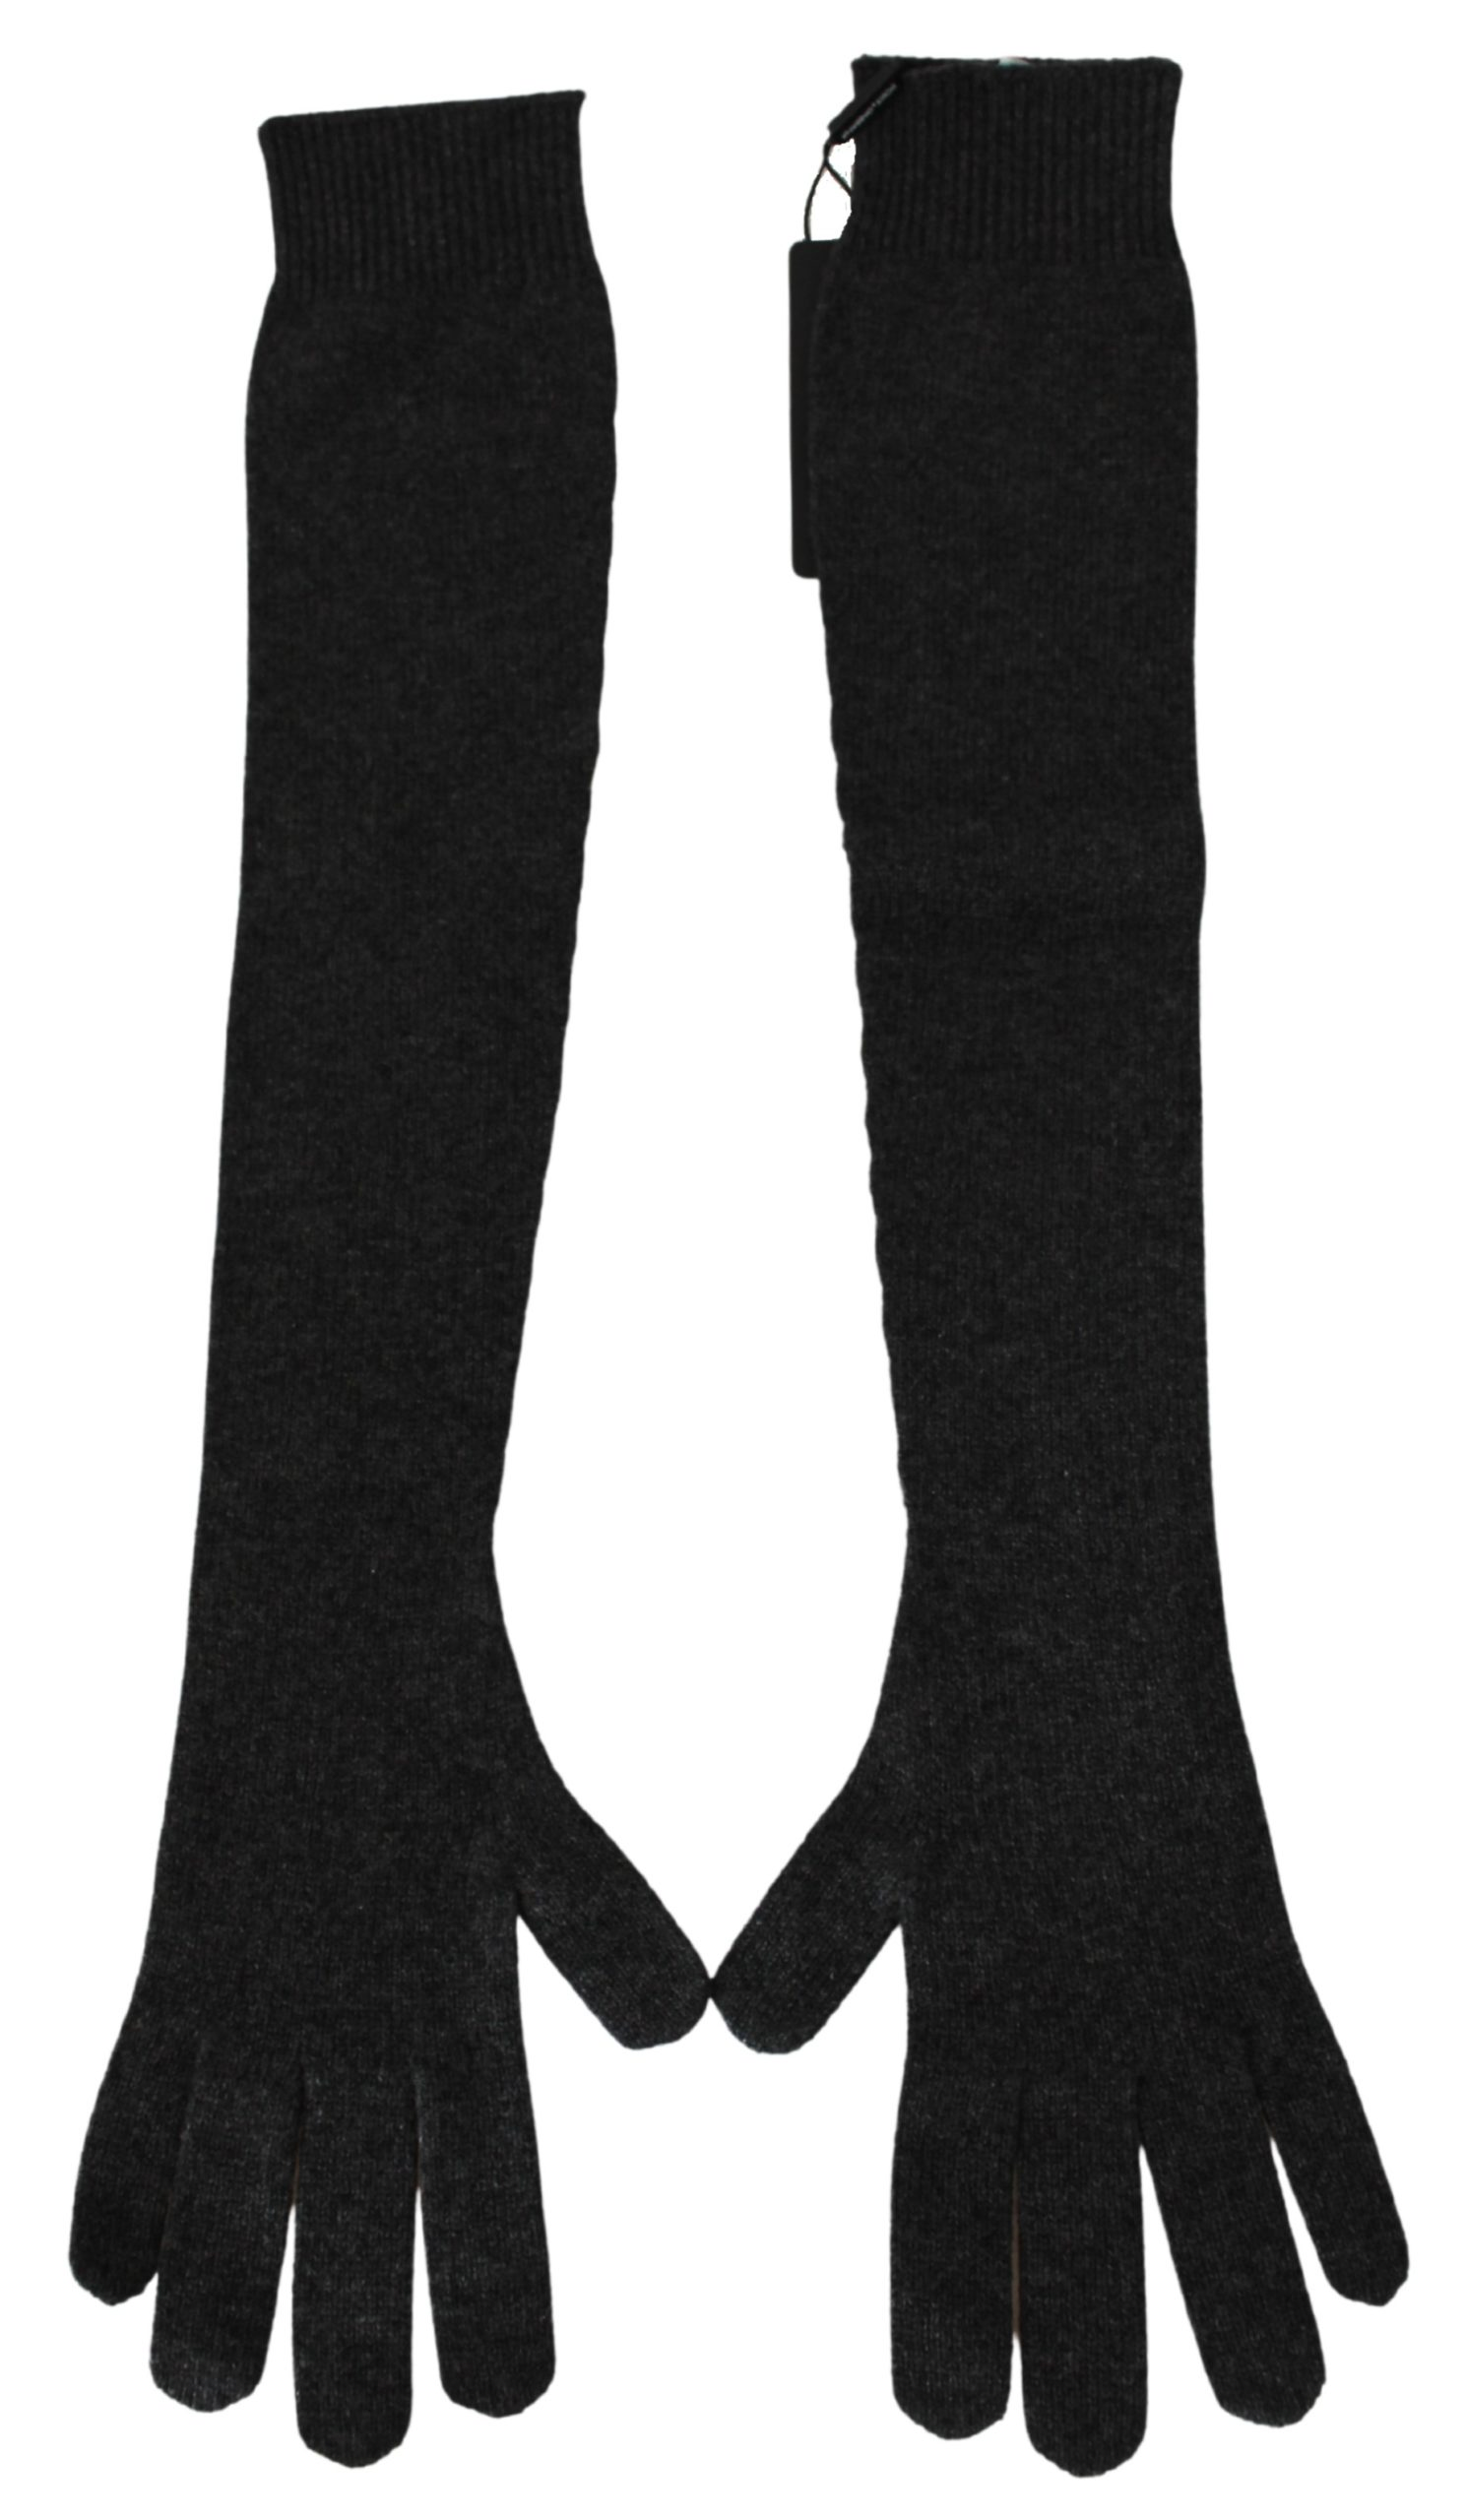 Dolce & Gabbana Women's Elbow Length Soft Warm Cashmere Gloves Gray LB1030 - 8.5 L